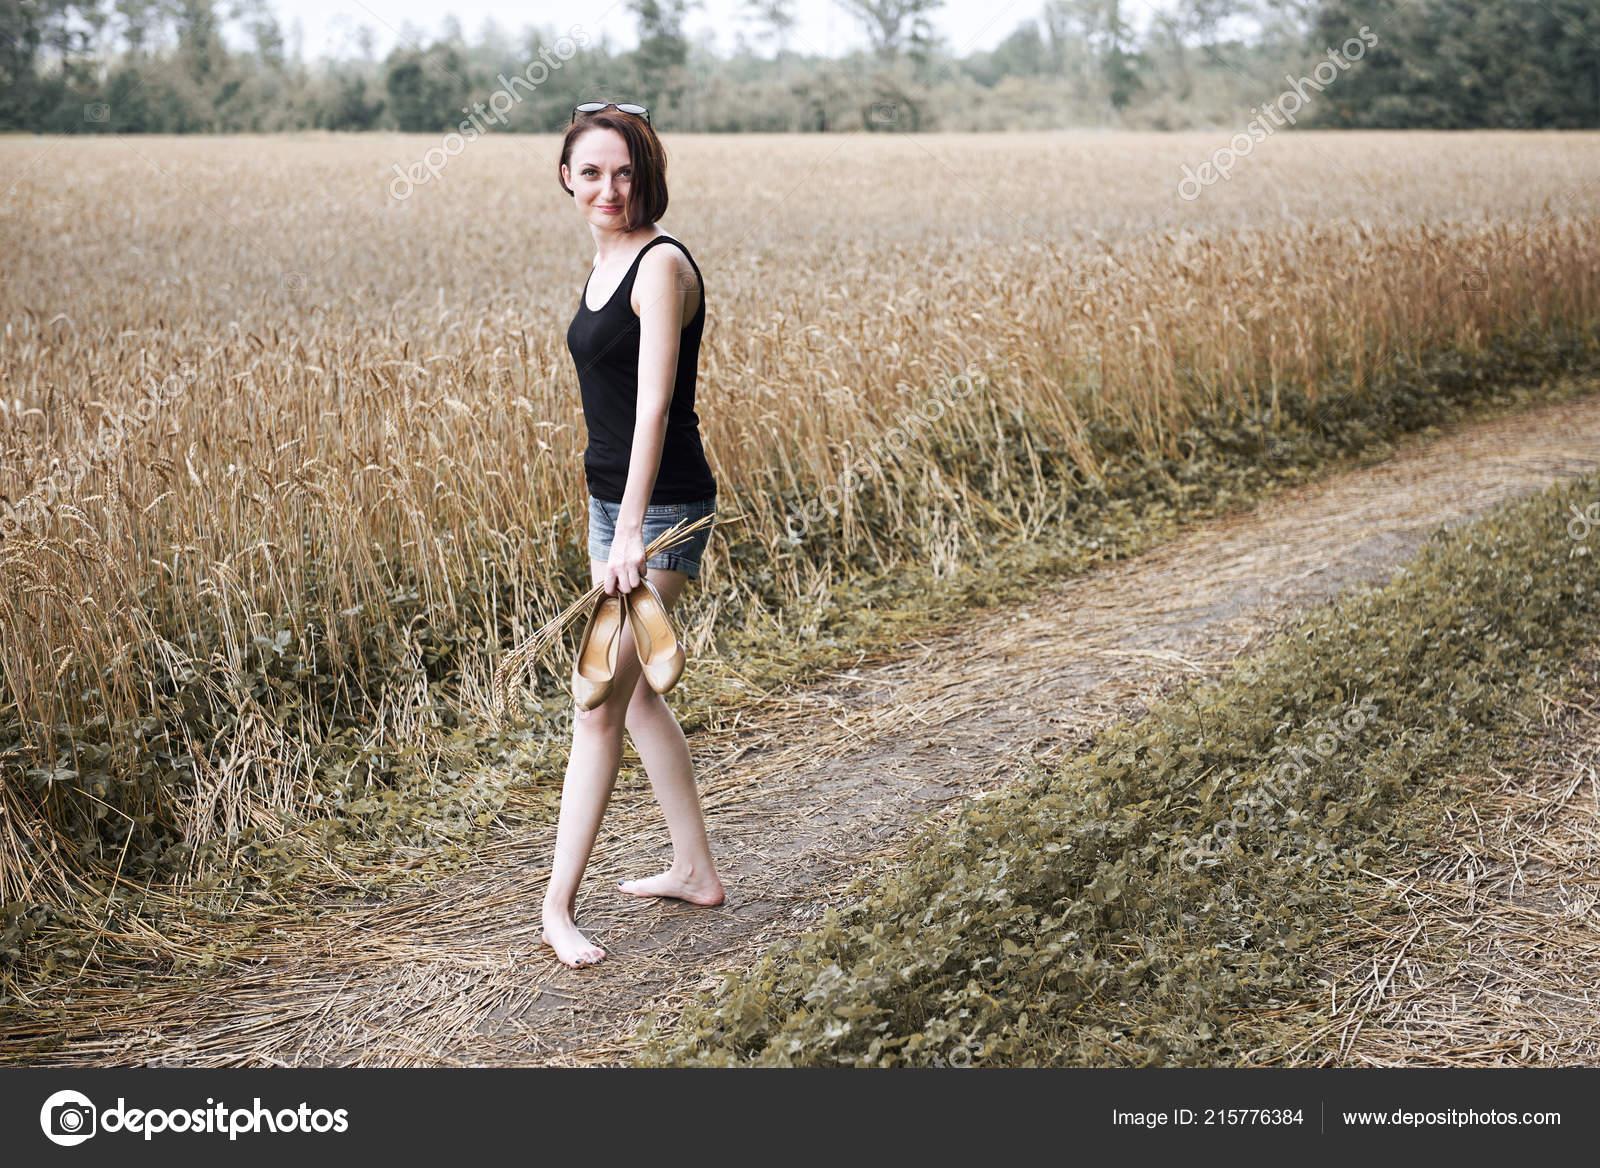 https://st4.depositphotos.com/1719616/21577/i/1600/depositphotos_215776384-stock-photo-young-girl-walking-barefoot-ground.jpg